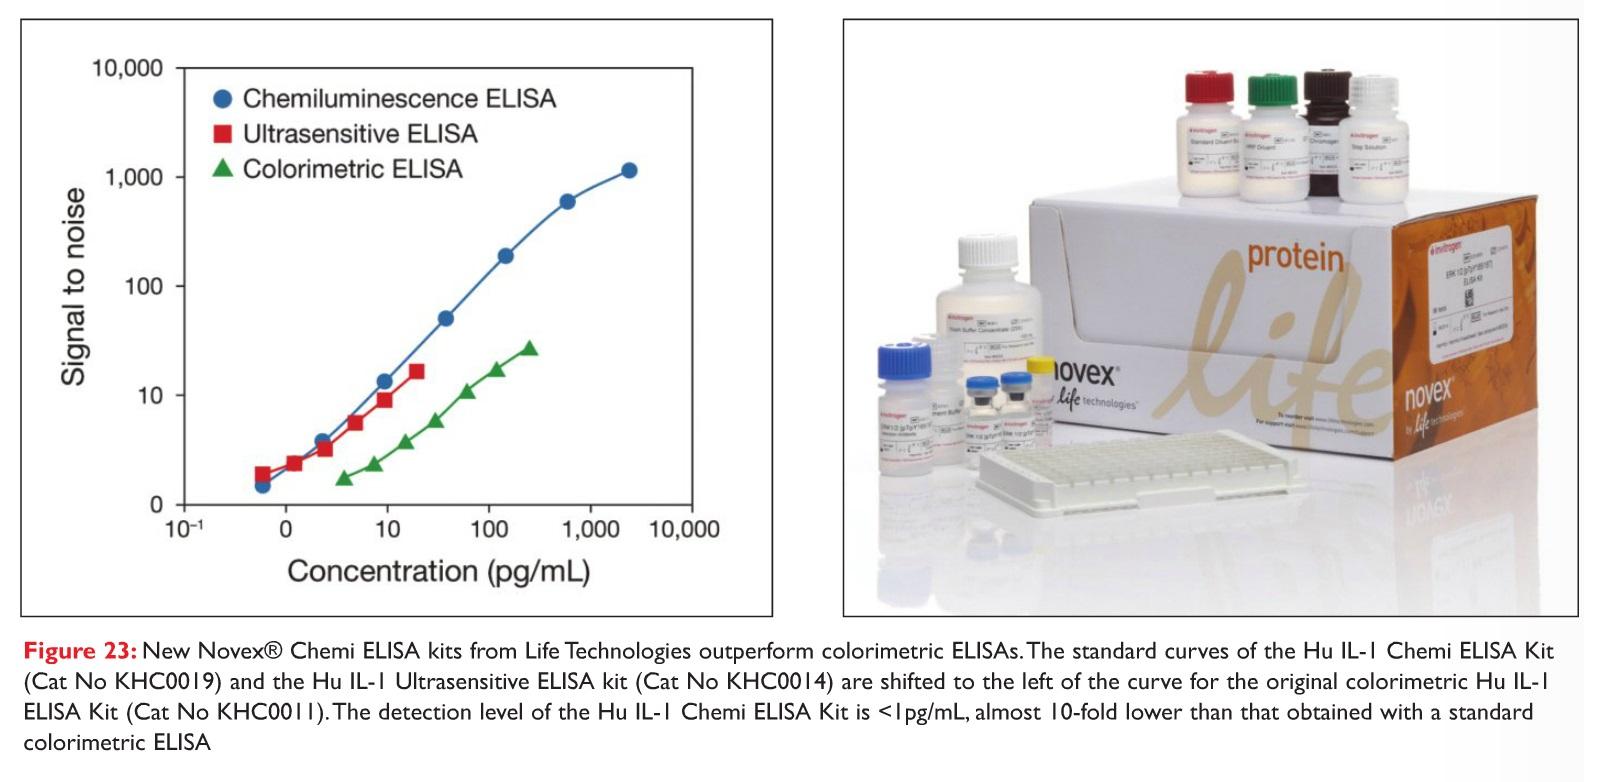 Figure 23 New Novex Chemi ELISA kits from Life Technologies